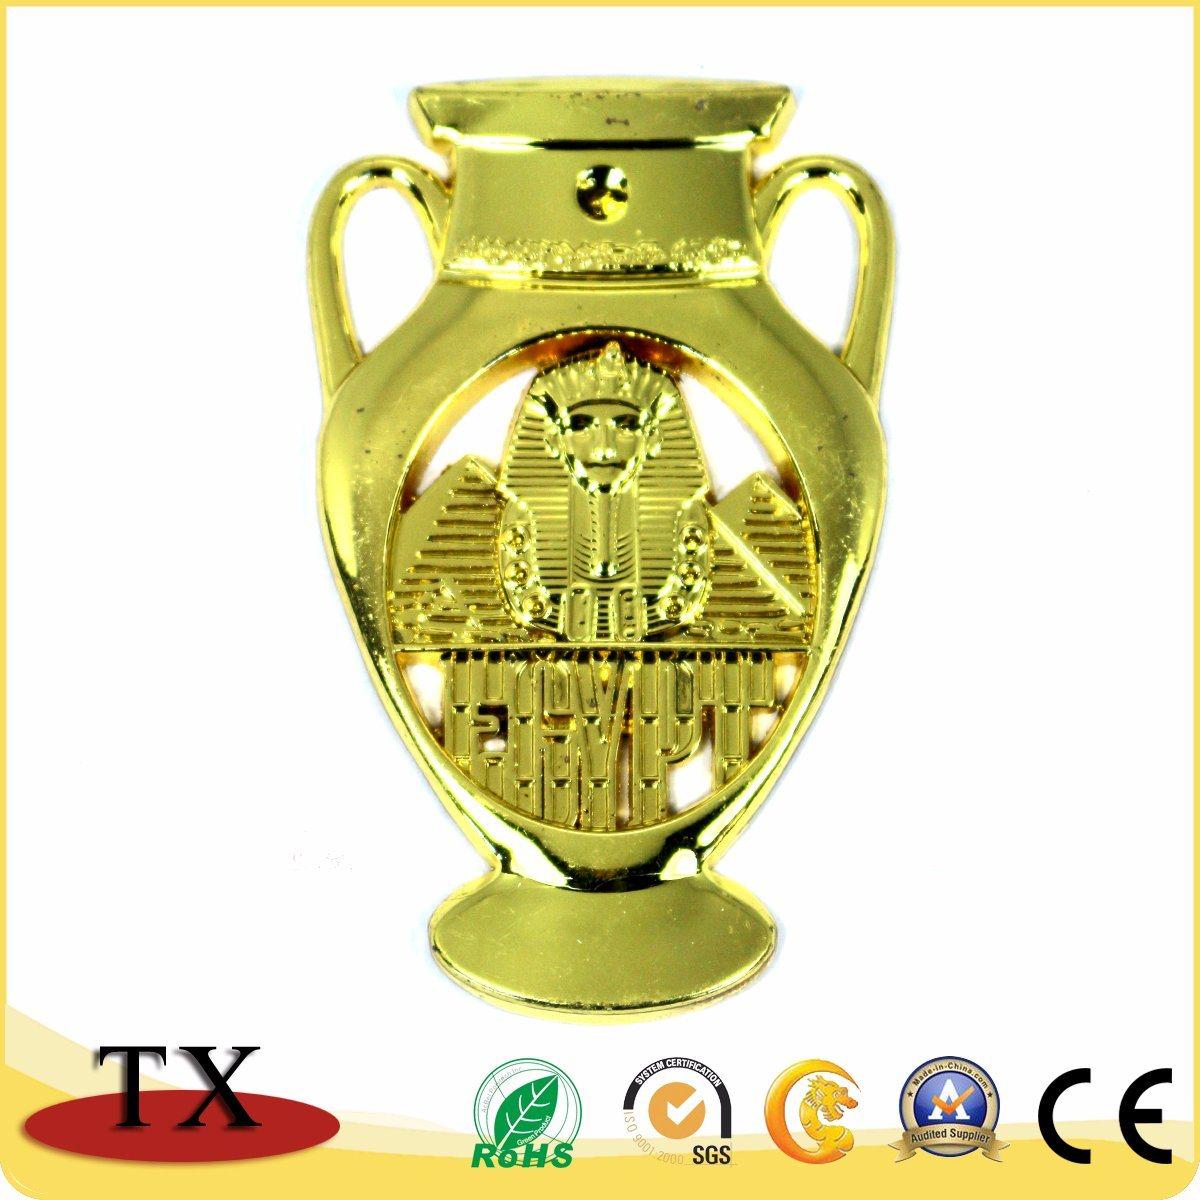 [Hot Item] Promotional Egypt Souvenir Trophy Magnet Good Price